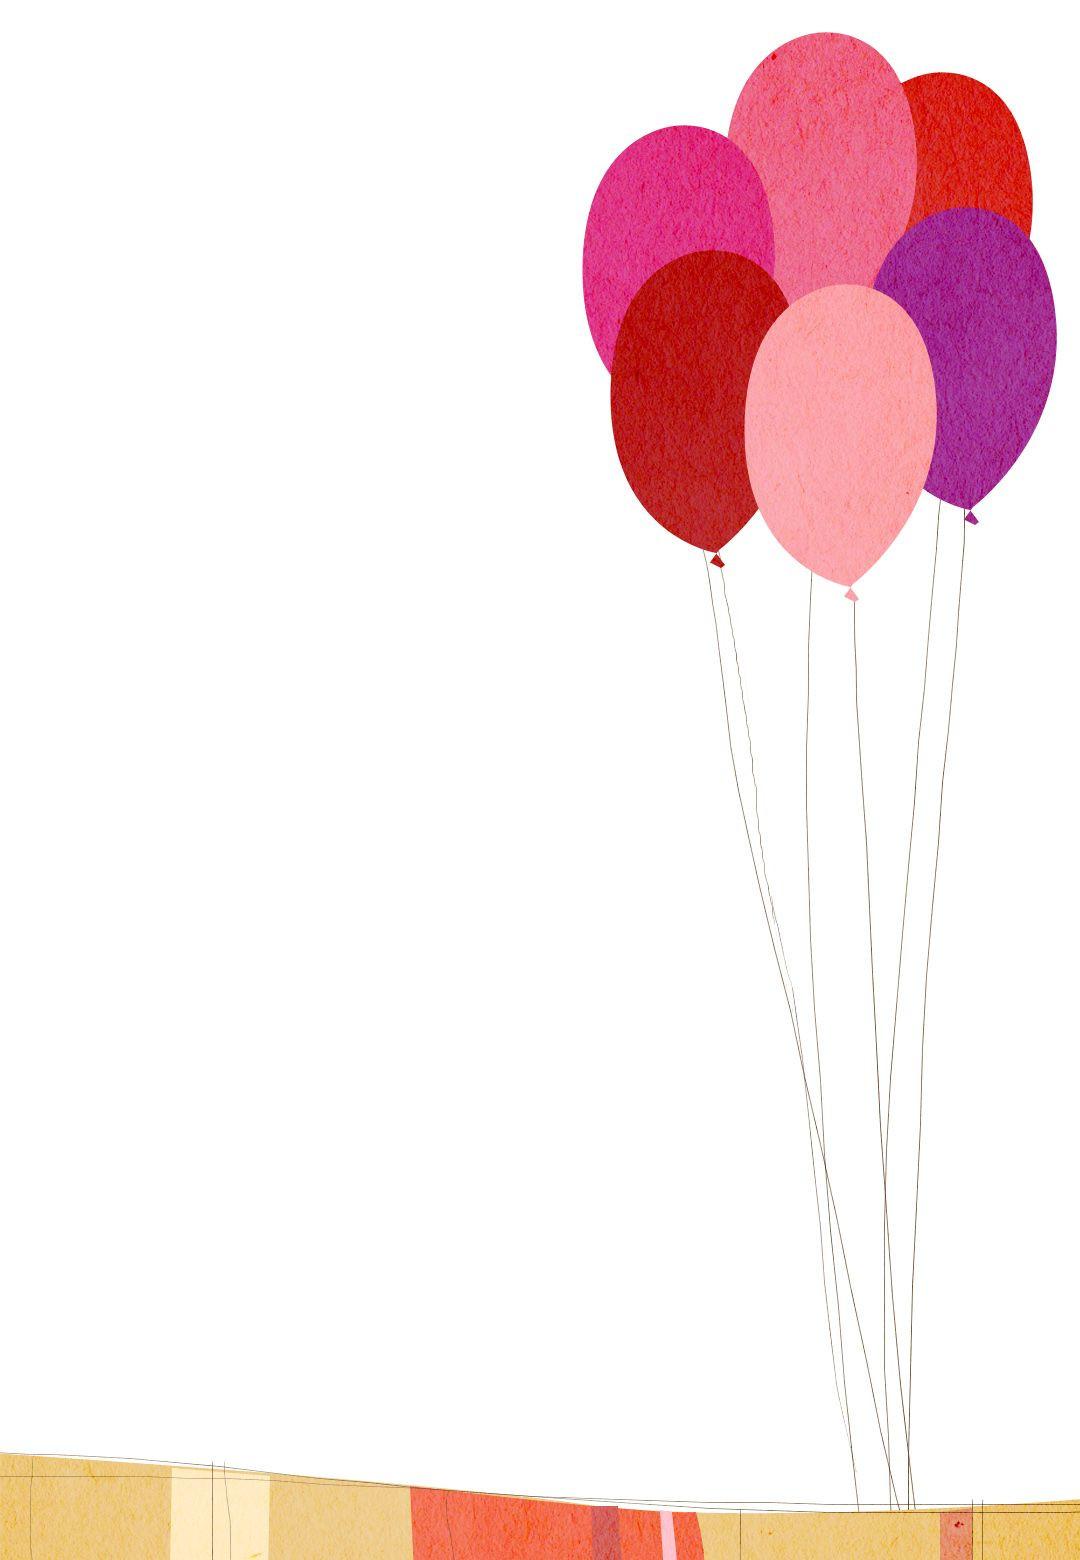 Balloon Birthday Invitations  Free Printable Birthday Balloons Invitation